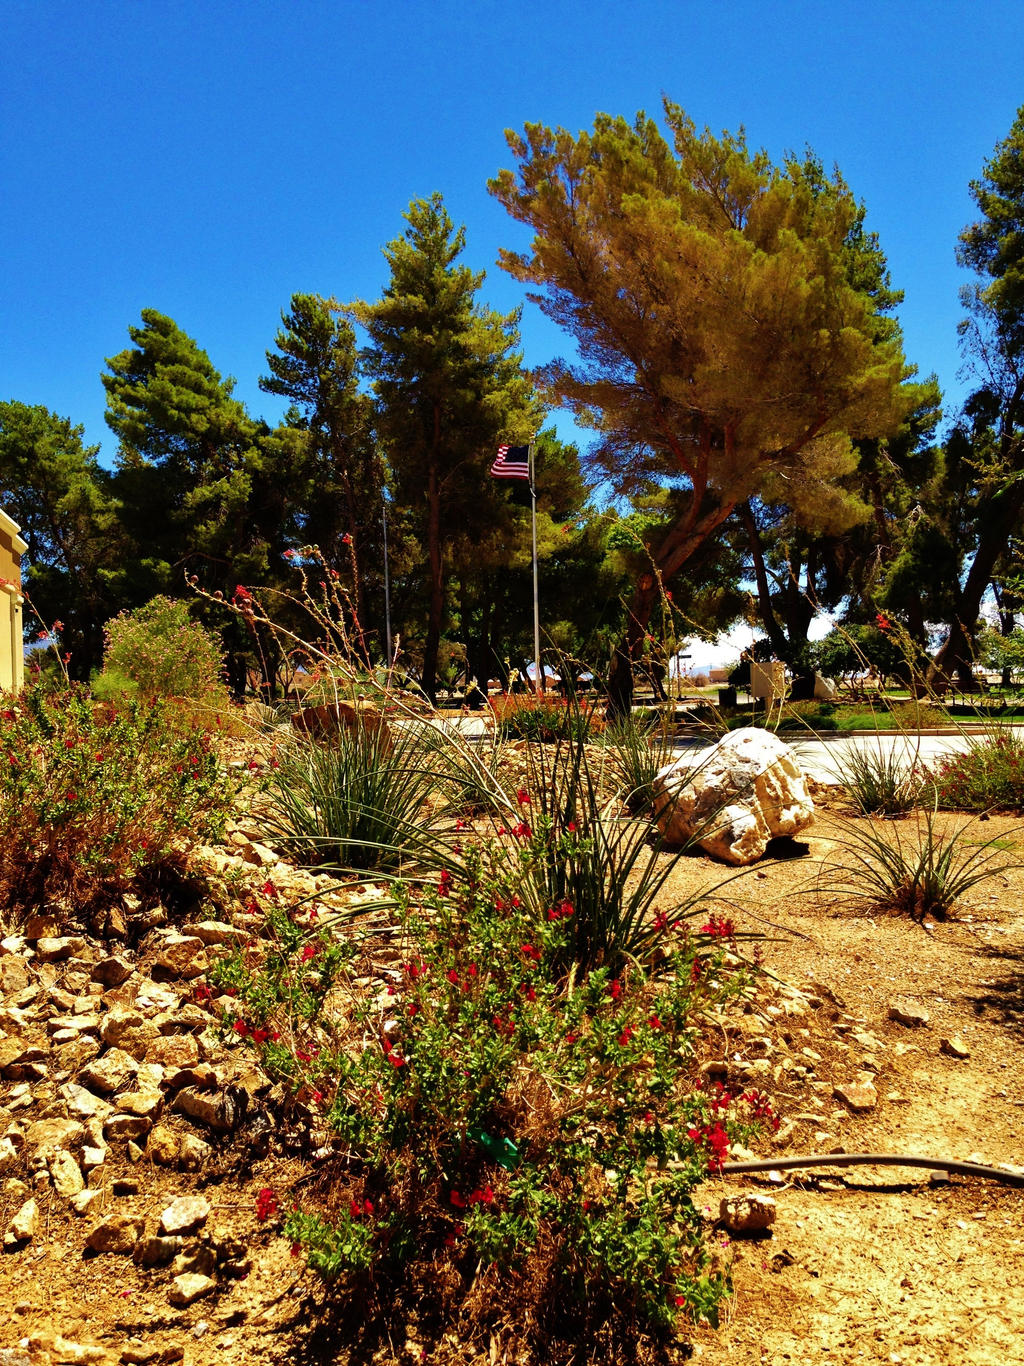 Desert Park by AthenaIce